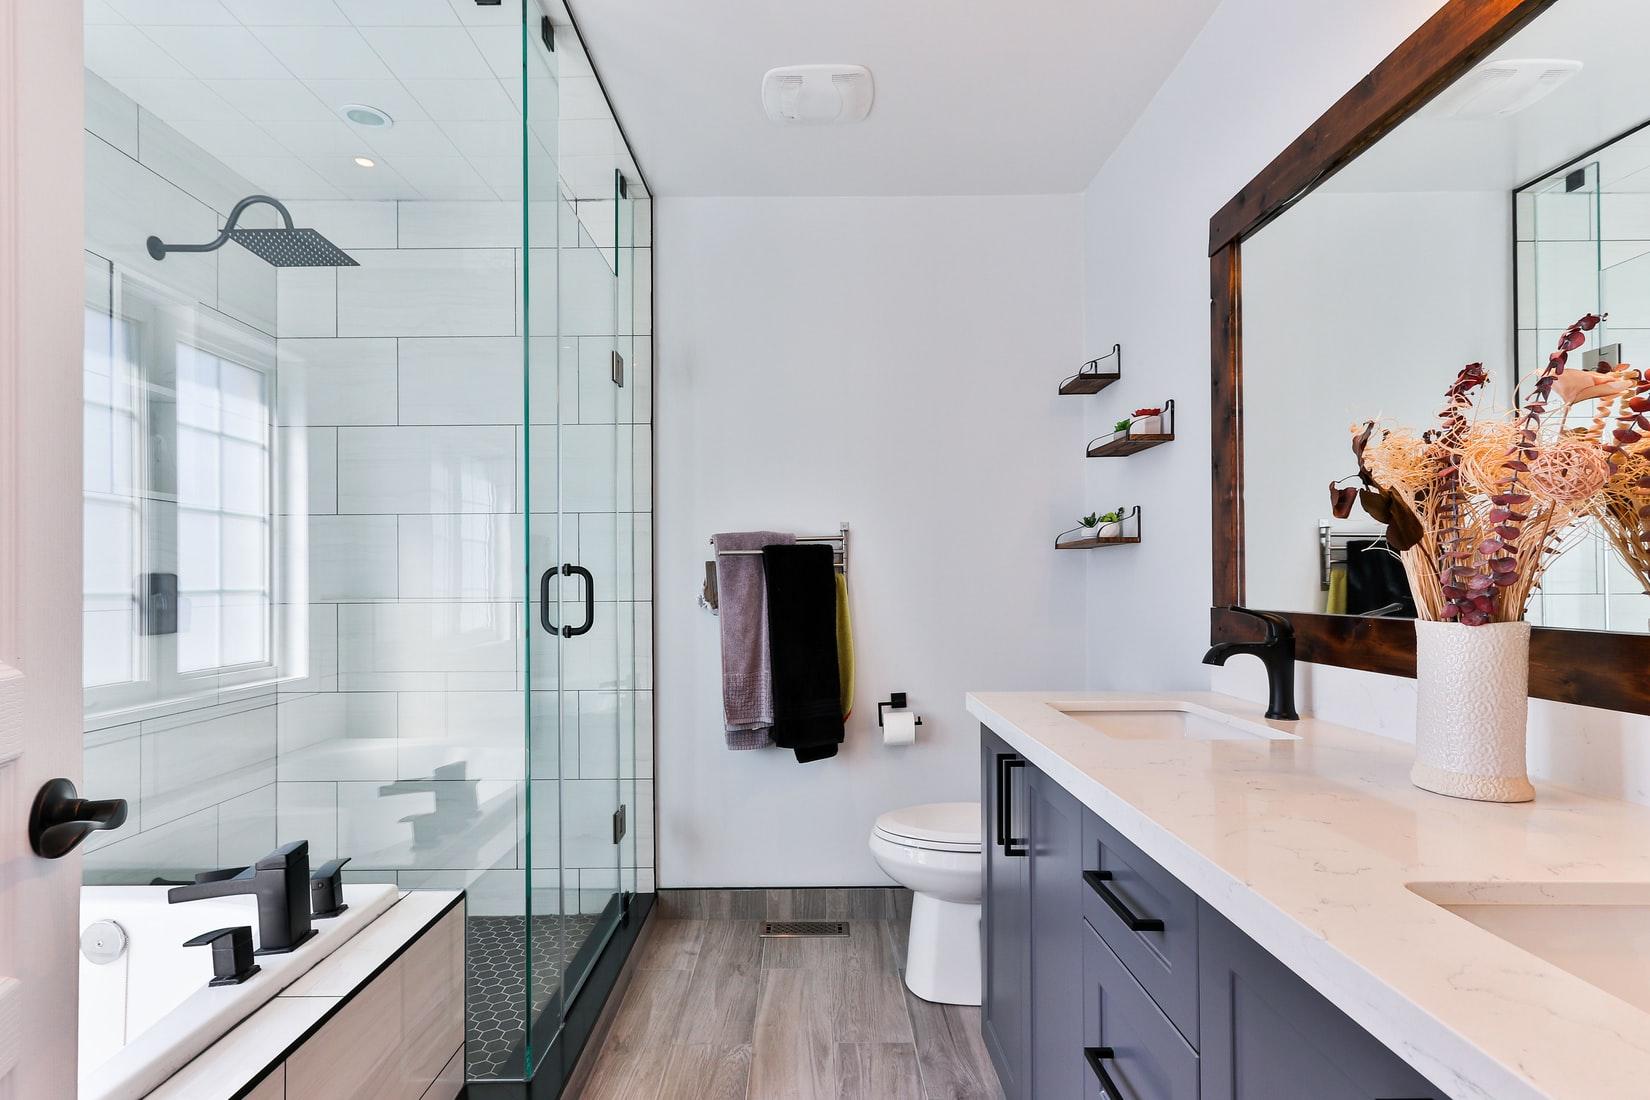 Bathroom Mold Remediation Contractor Long Beach CA